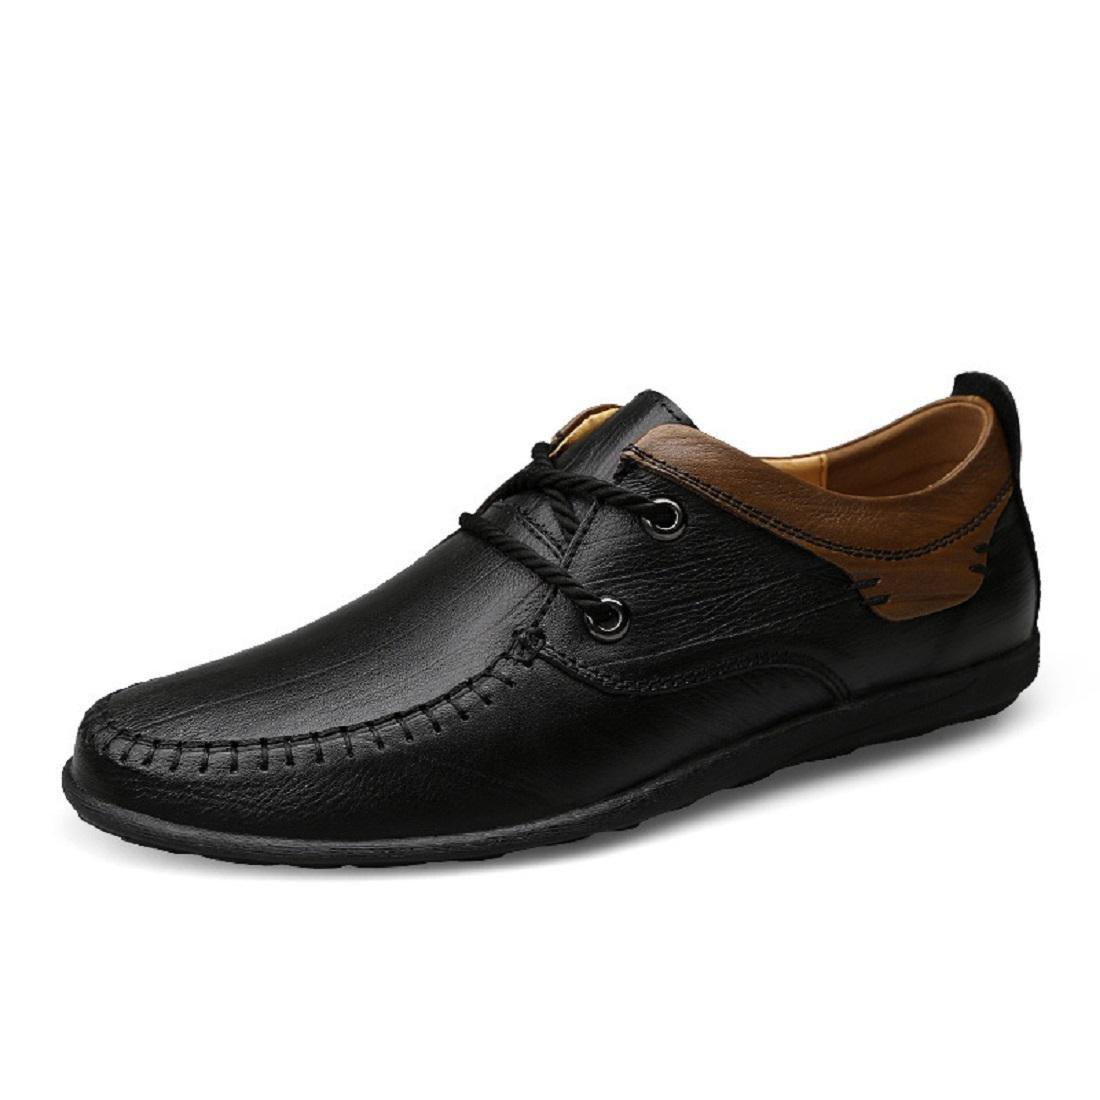 Herren Lederschuhe Mode Freizeit Licht Lässige Schuhe Atmungsaktiv Flache Schuhe EUR GRÖSSE 38-45